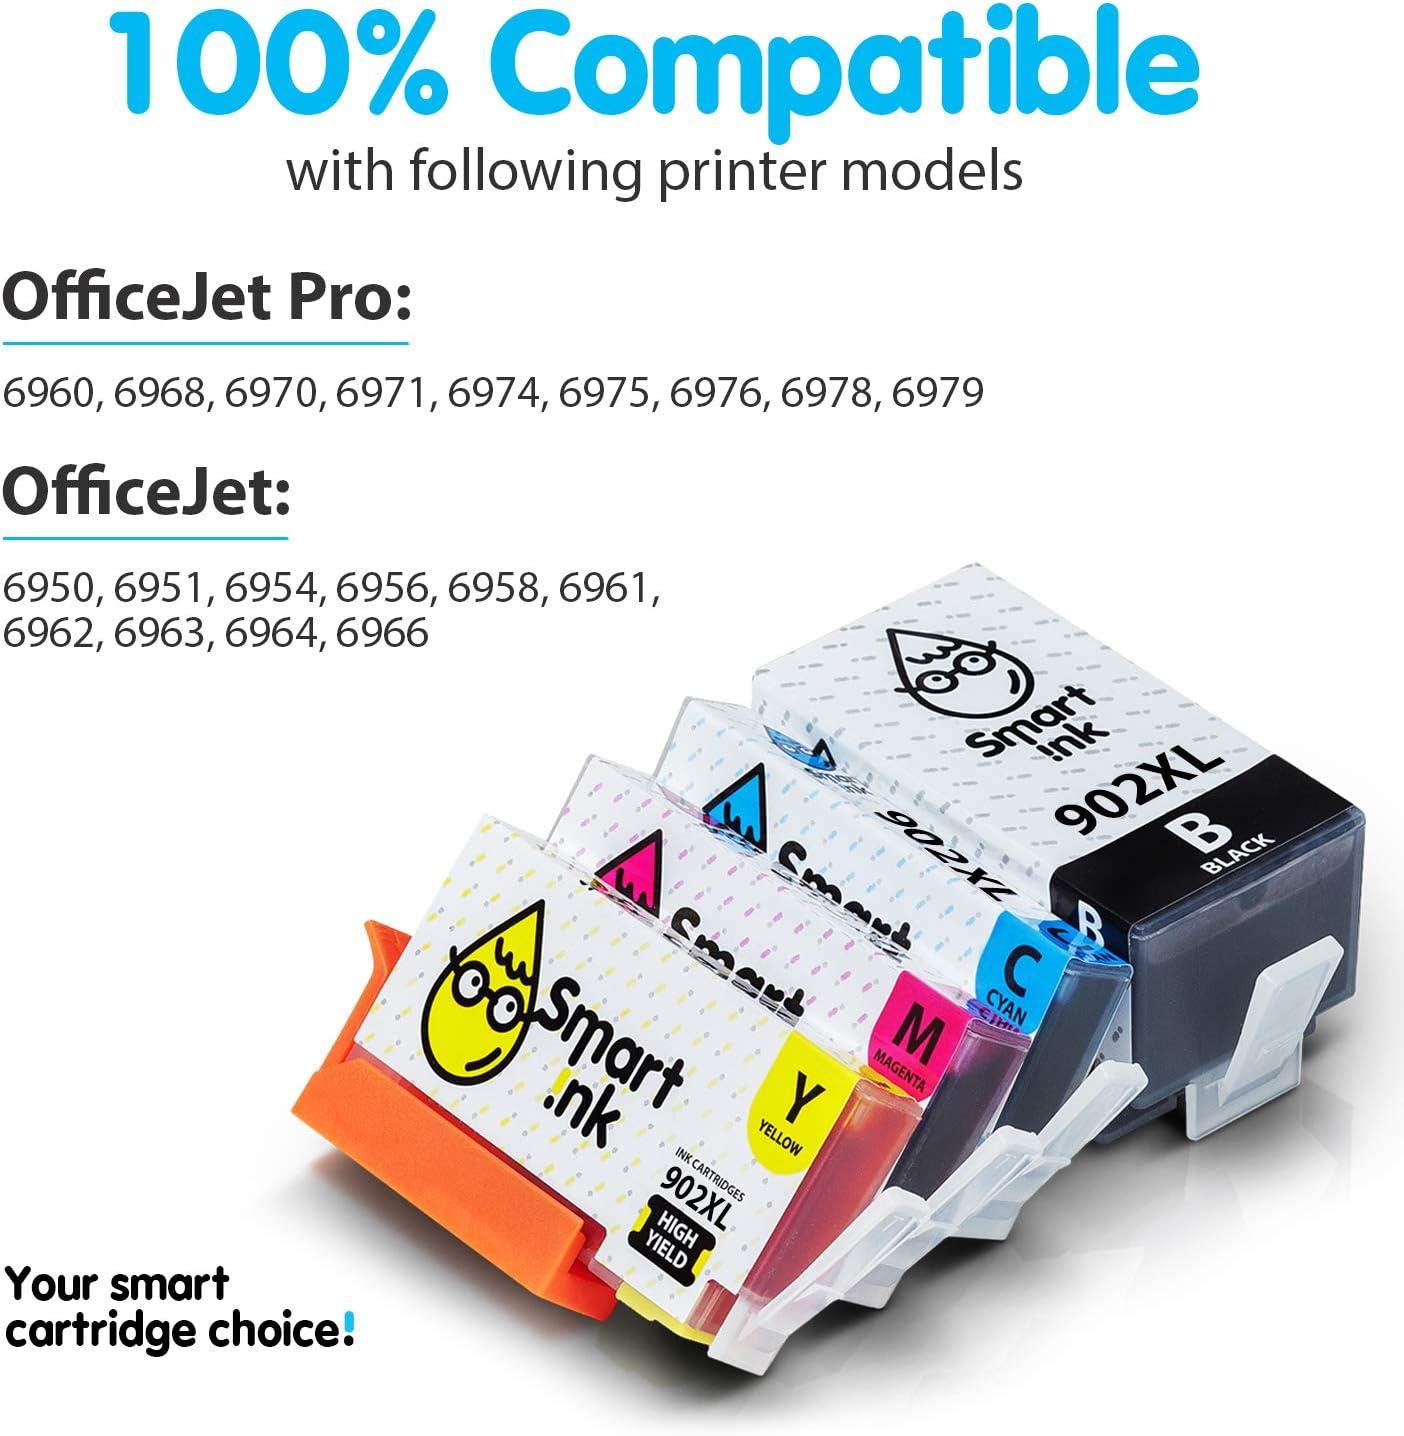 New Genuine Hp 902XL ink cartridge 902 Color Yellow Cyan Magenta Lot Fresh Exp.